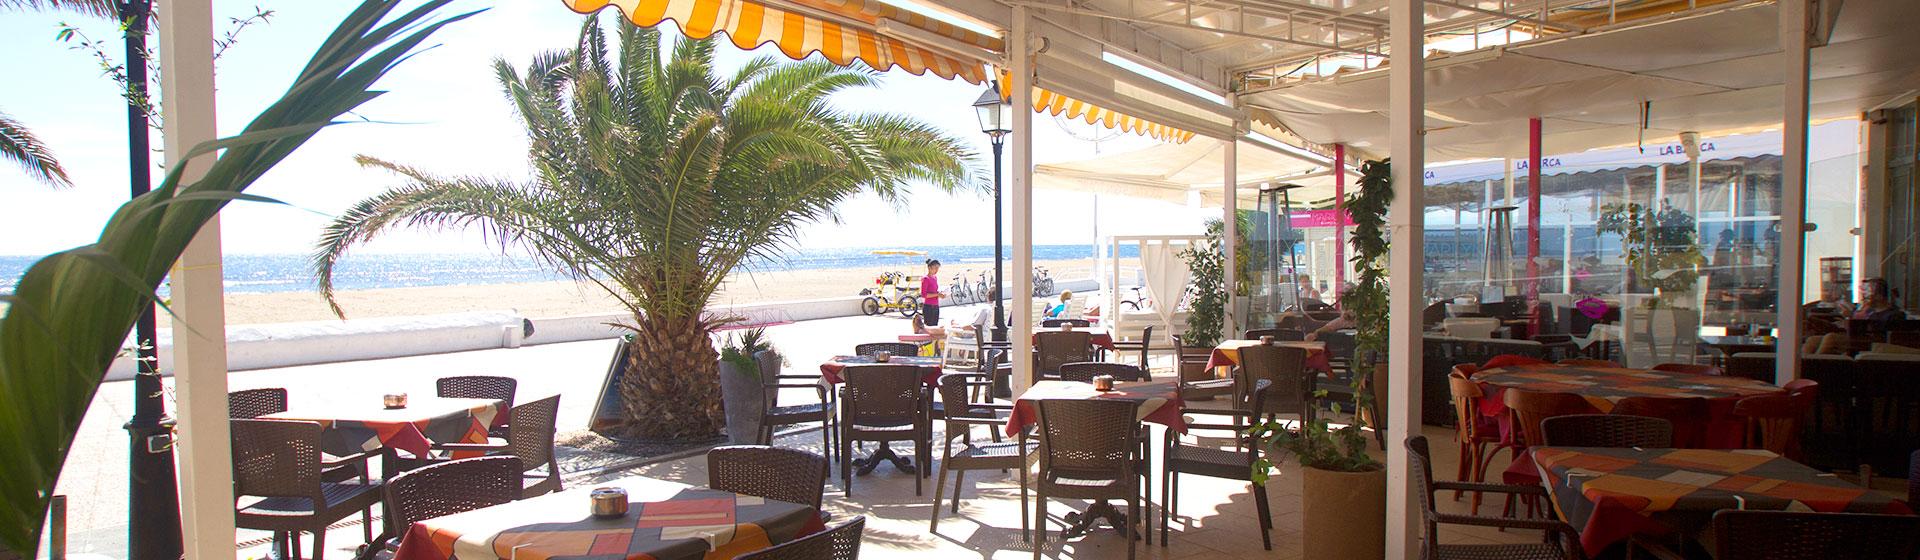 slide_ubicacion_03_pizzeria-restaurante_erik_lanzarote